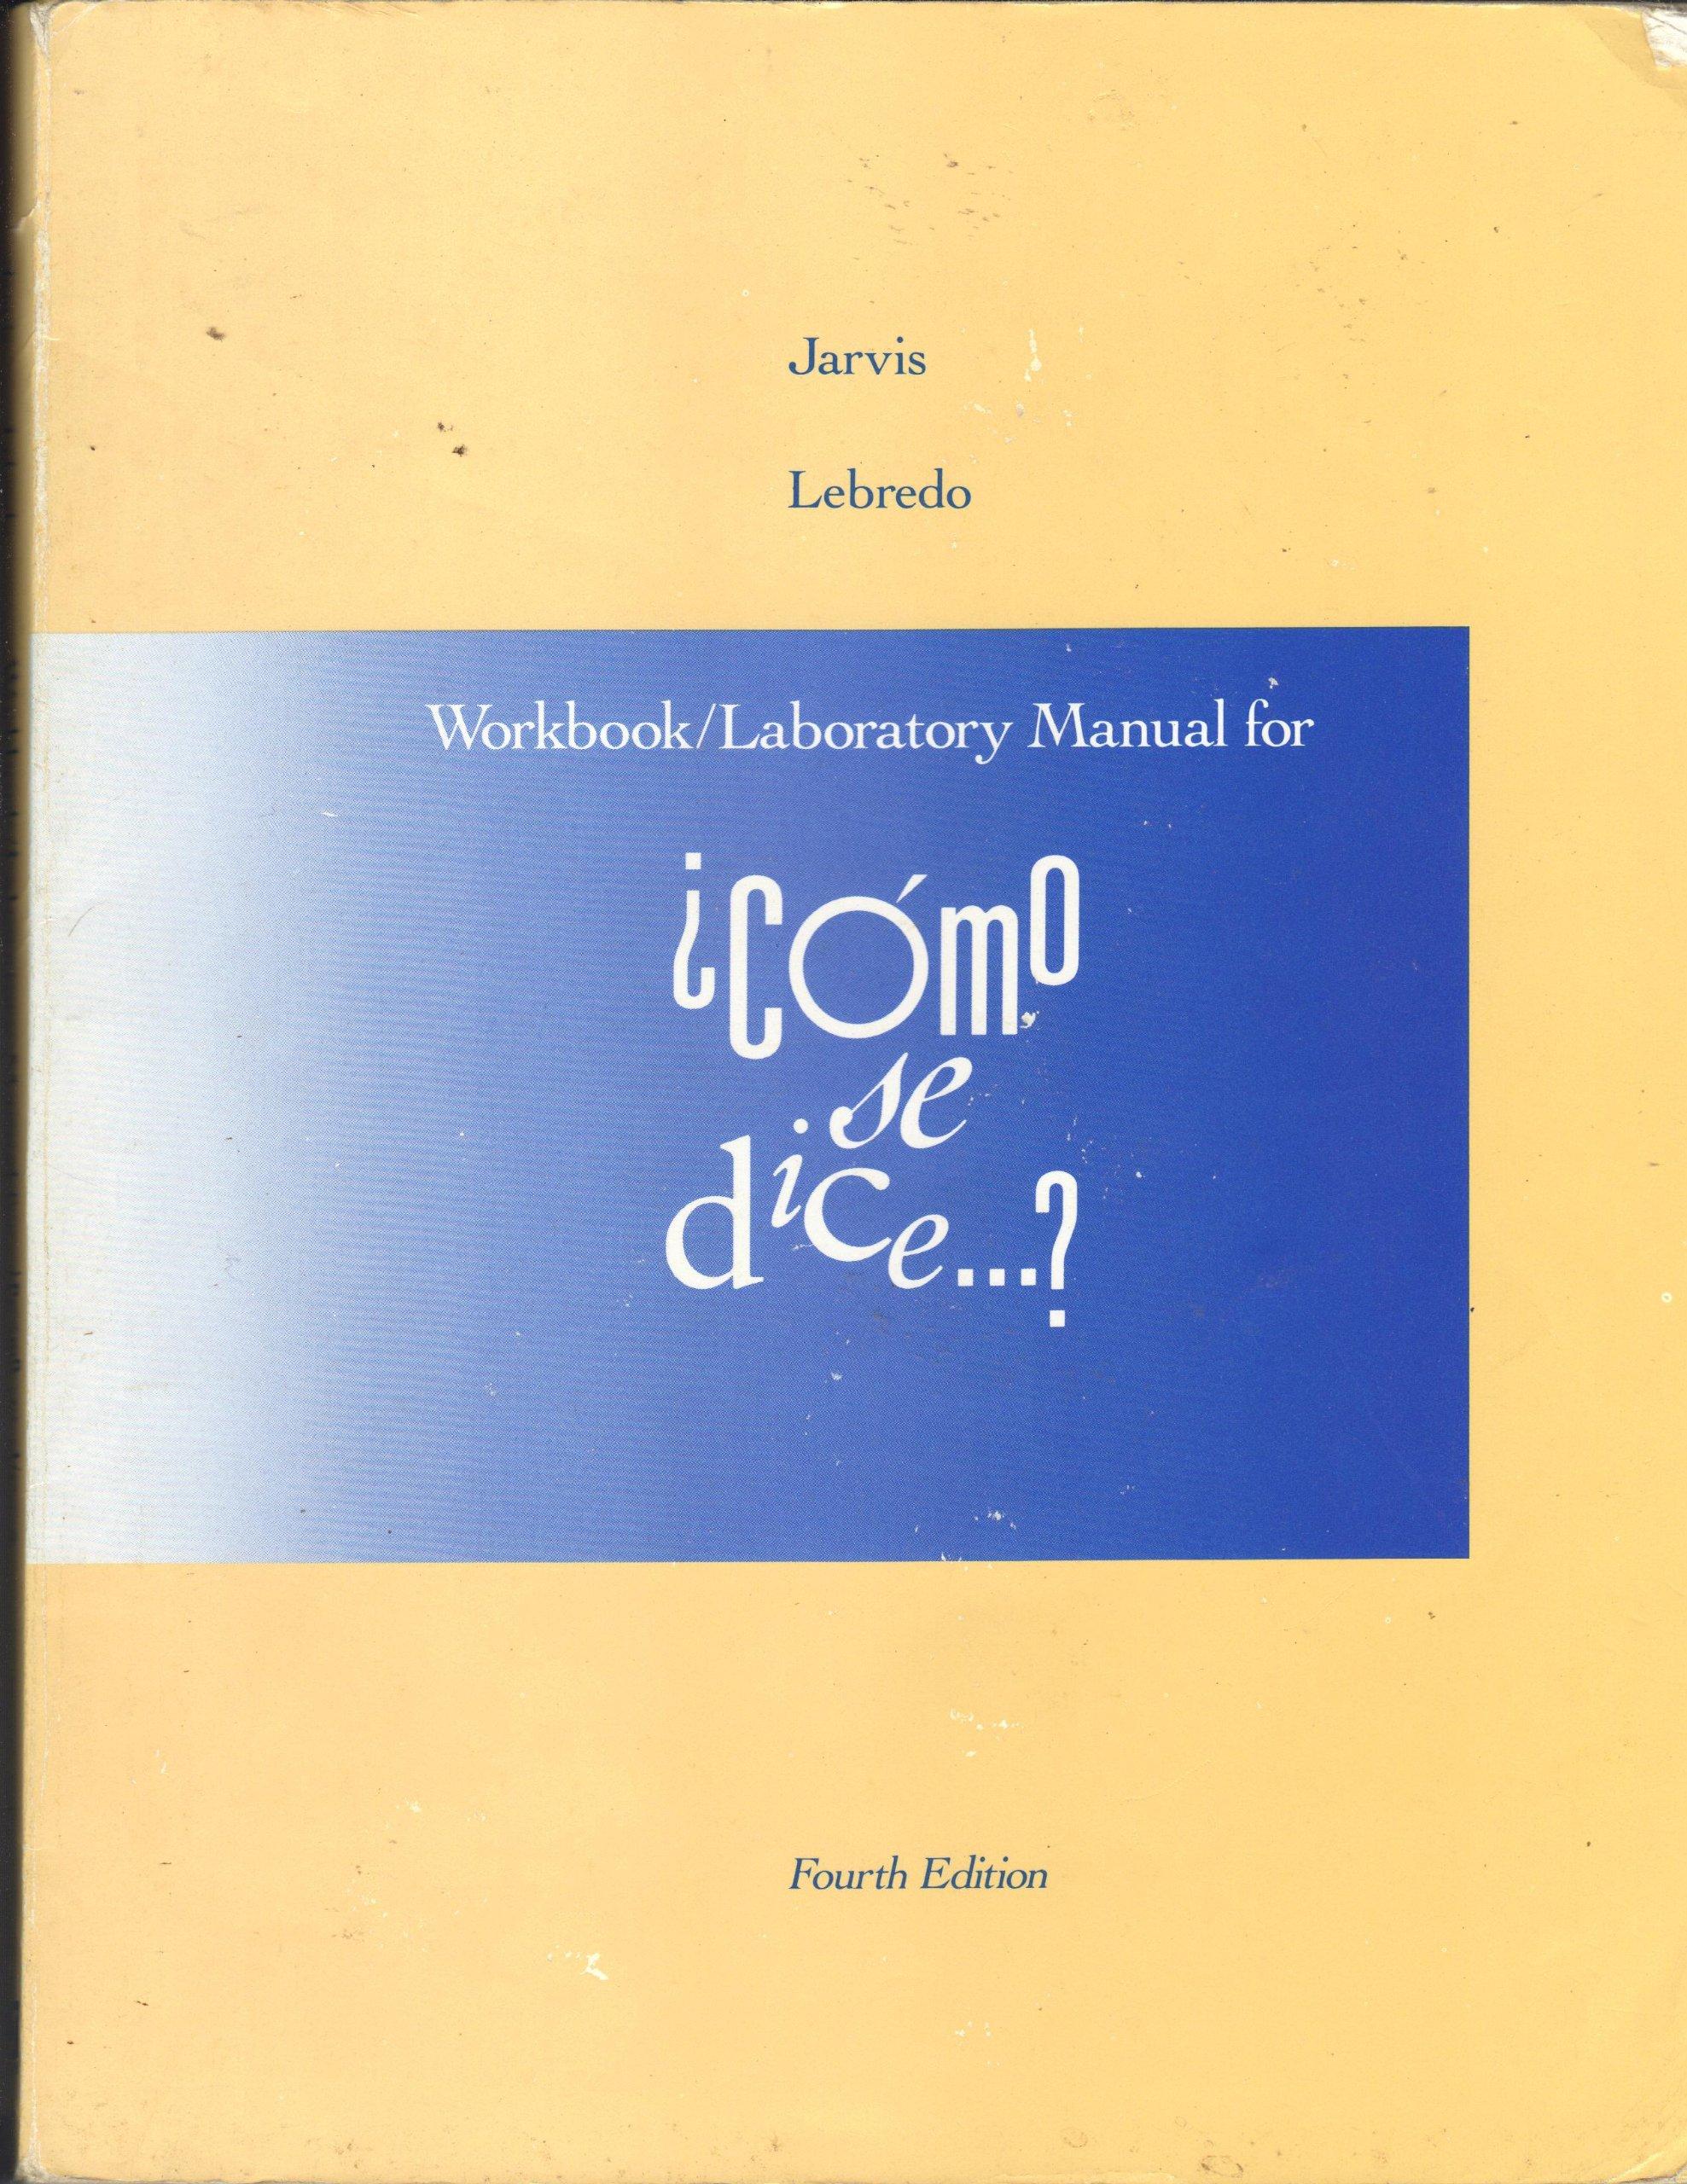 Como Se Dice, 4th Edition, WORKBOOK / LABORATORY MANUAL: Jarvis, Lebredo:  Amazon.com: Books